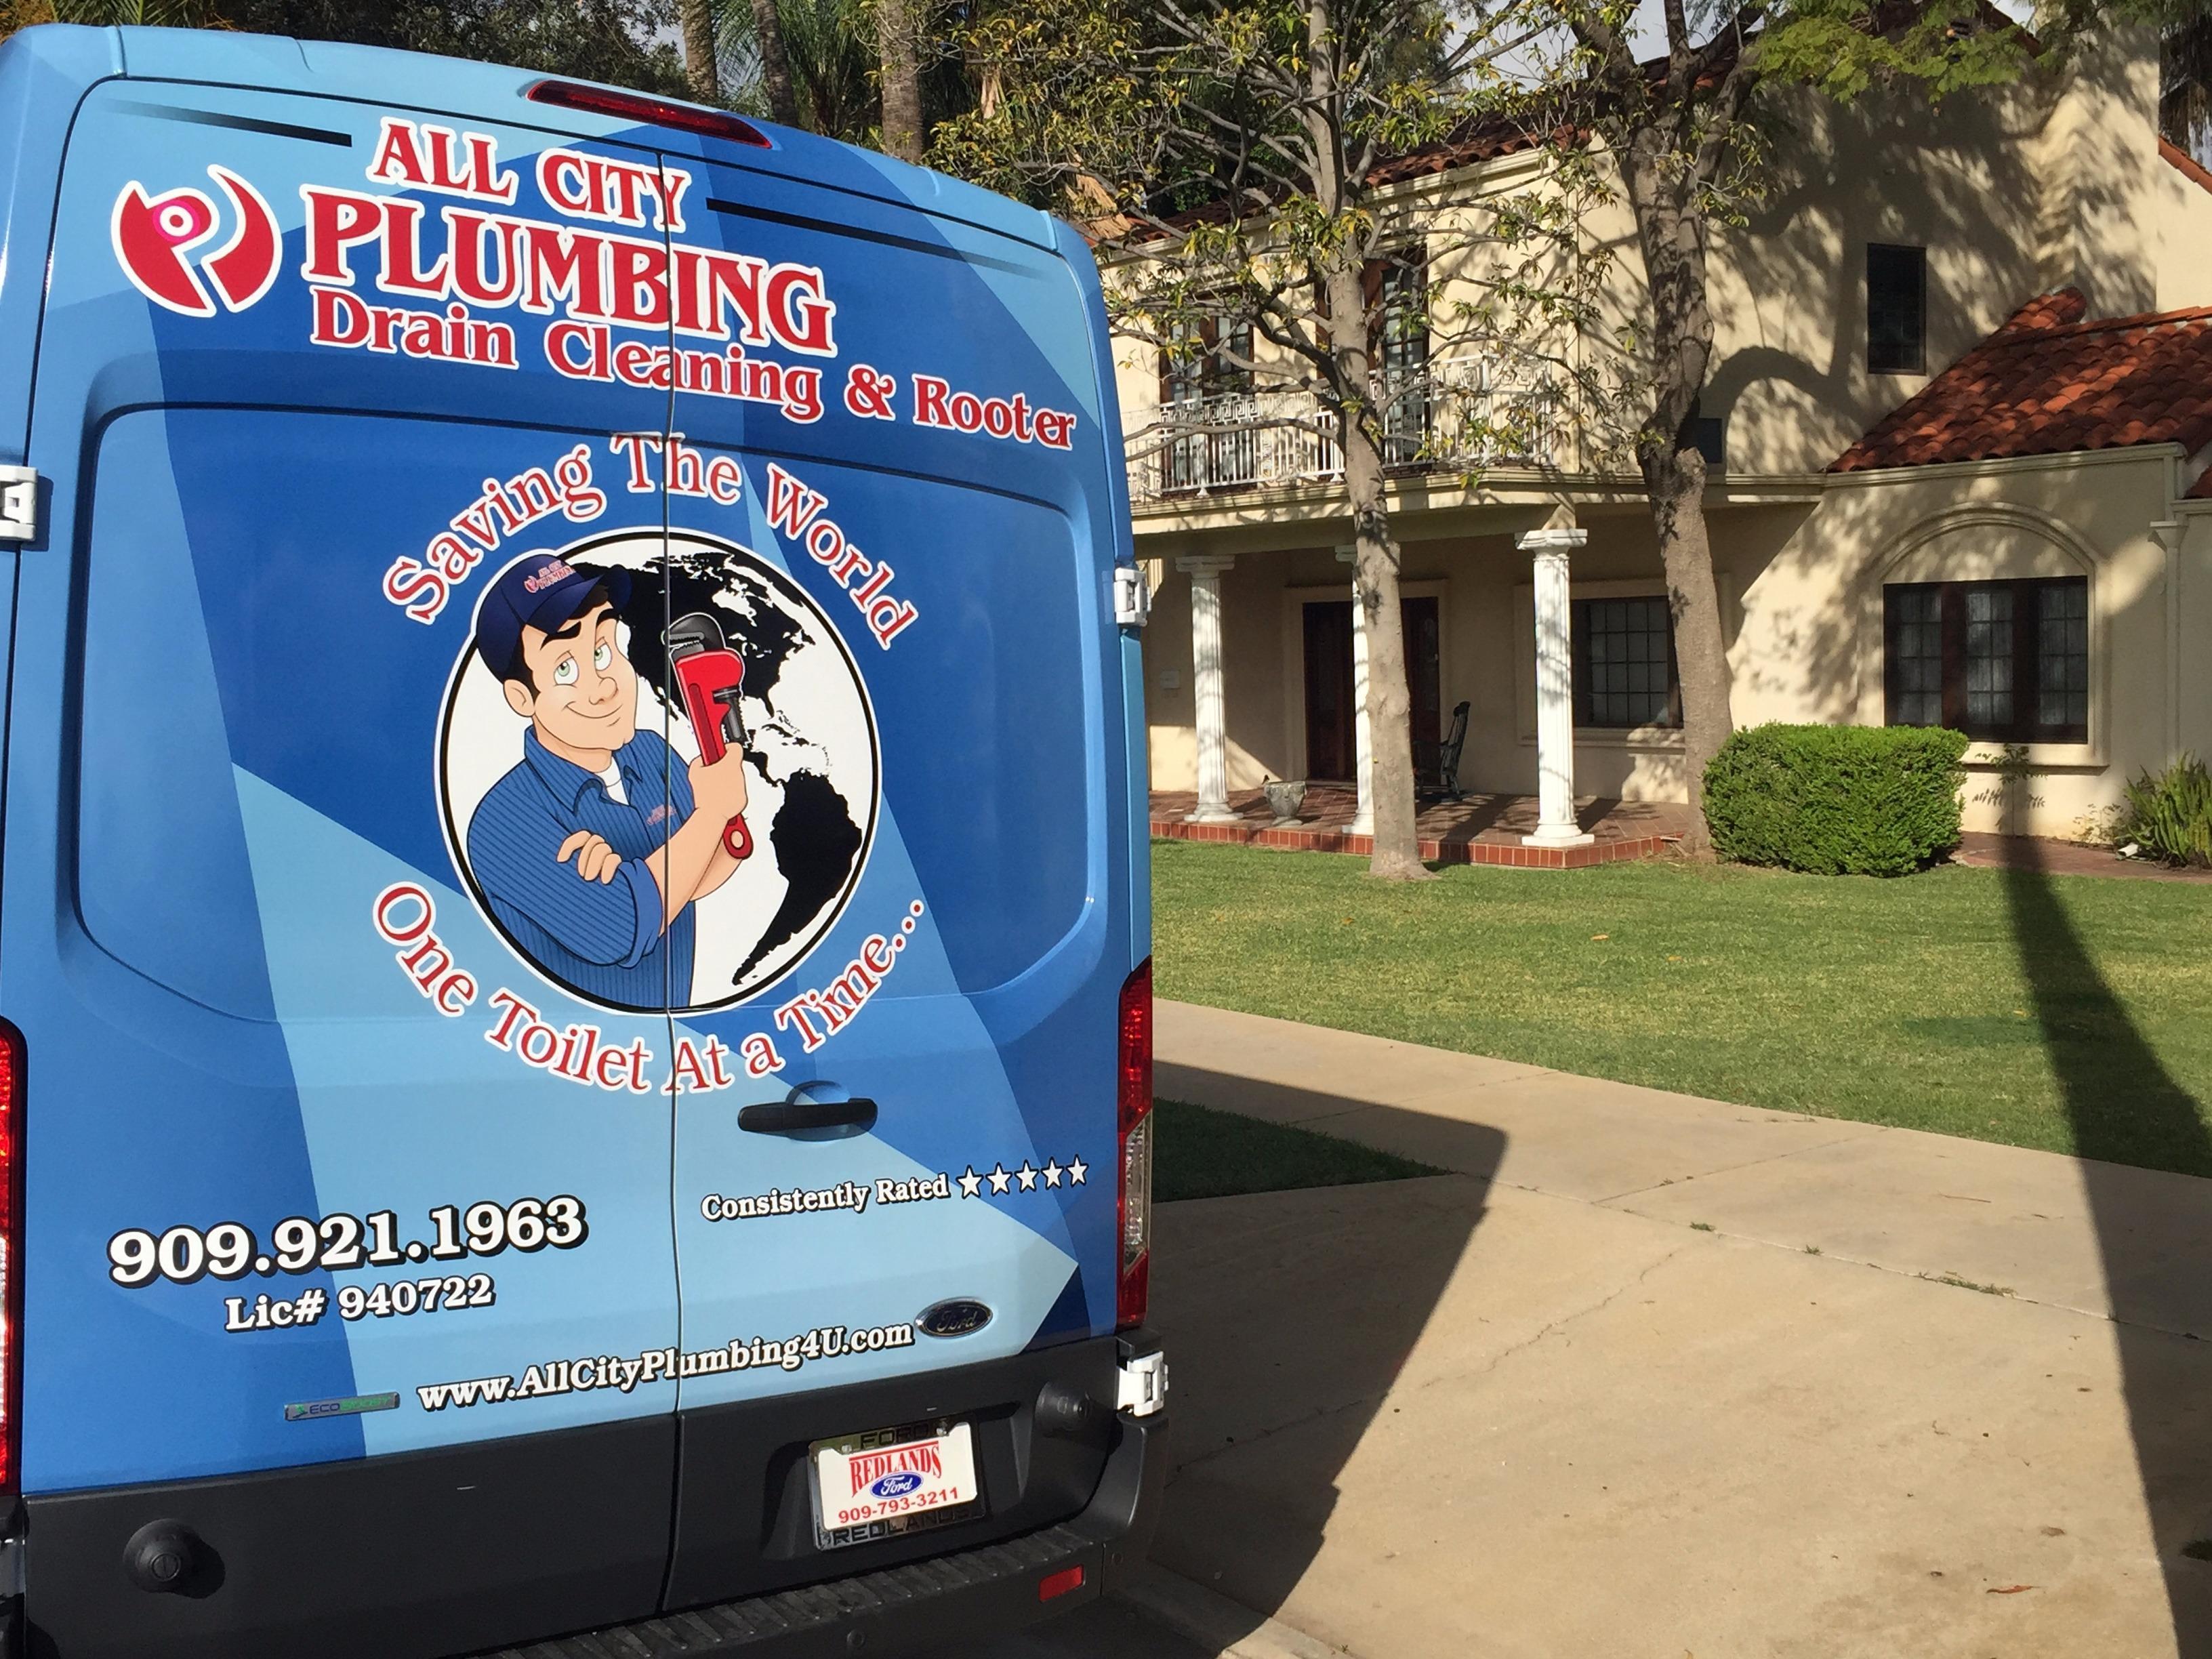 All City Plumbing image 1